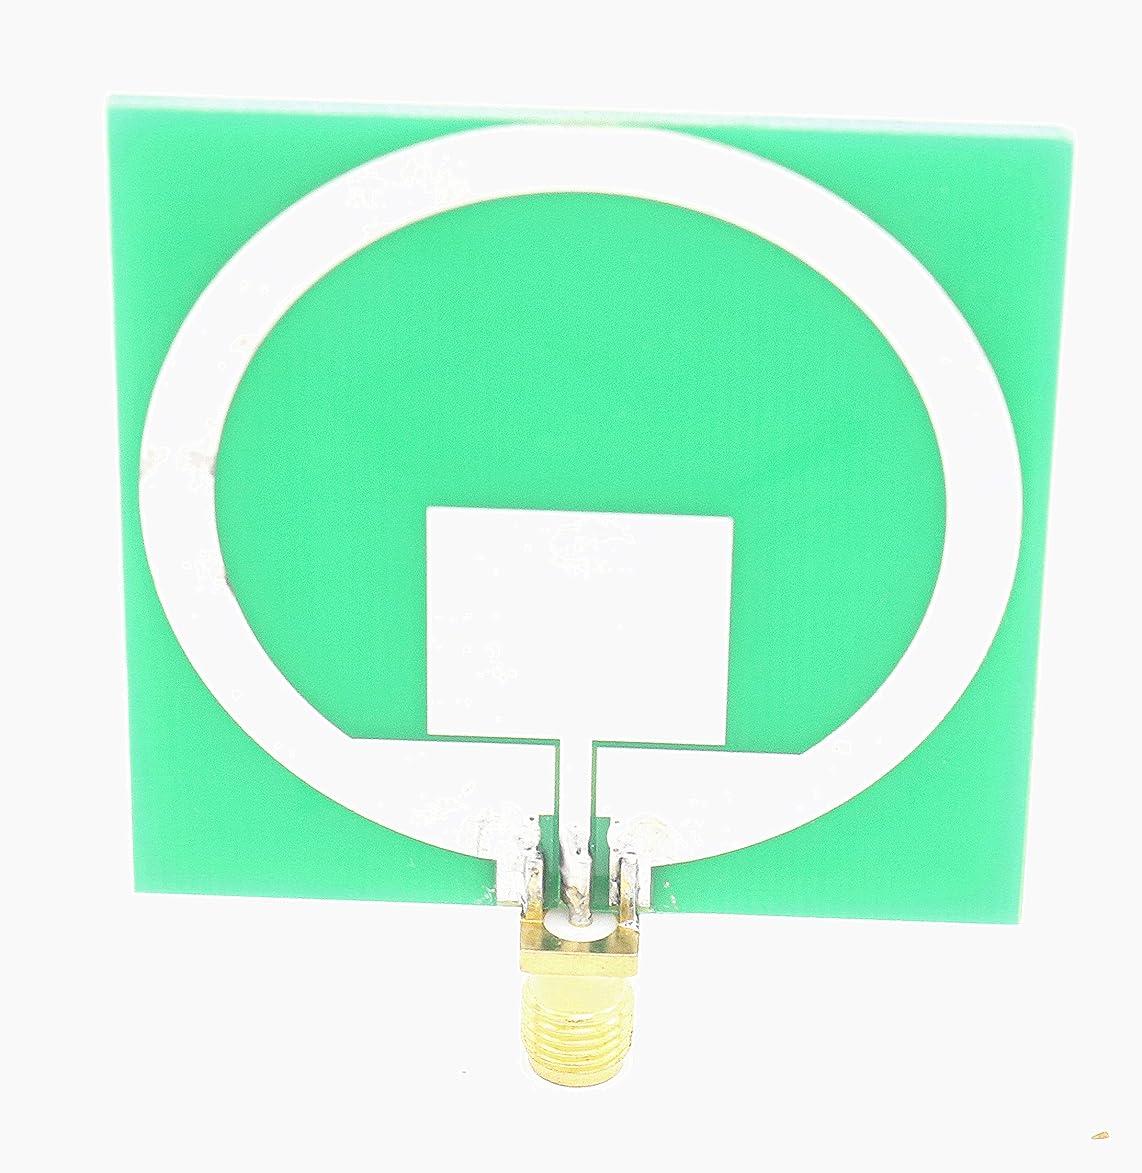 SMAKN Ultra Wide band UWB Antenna 2.4GHz - 10.5 GHz for UWB TX/RX SDR RADAR GPR SIGINT EMC TEST ADSB WIFI FVP DRONE VIDEO VIVALDI ANTENNA